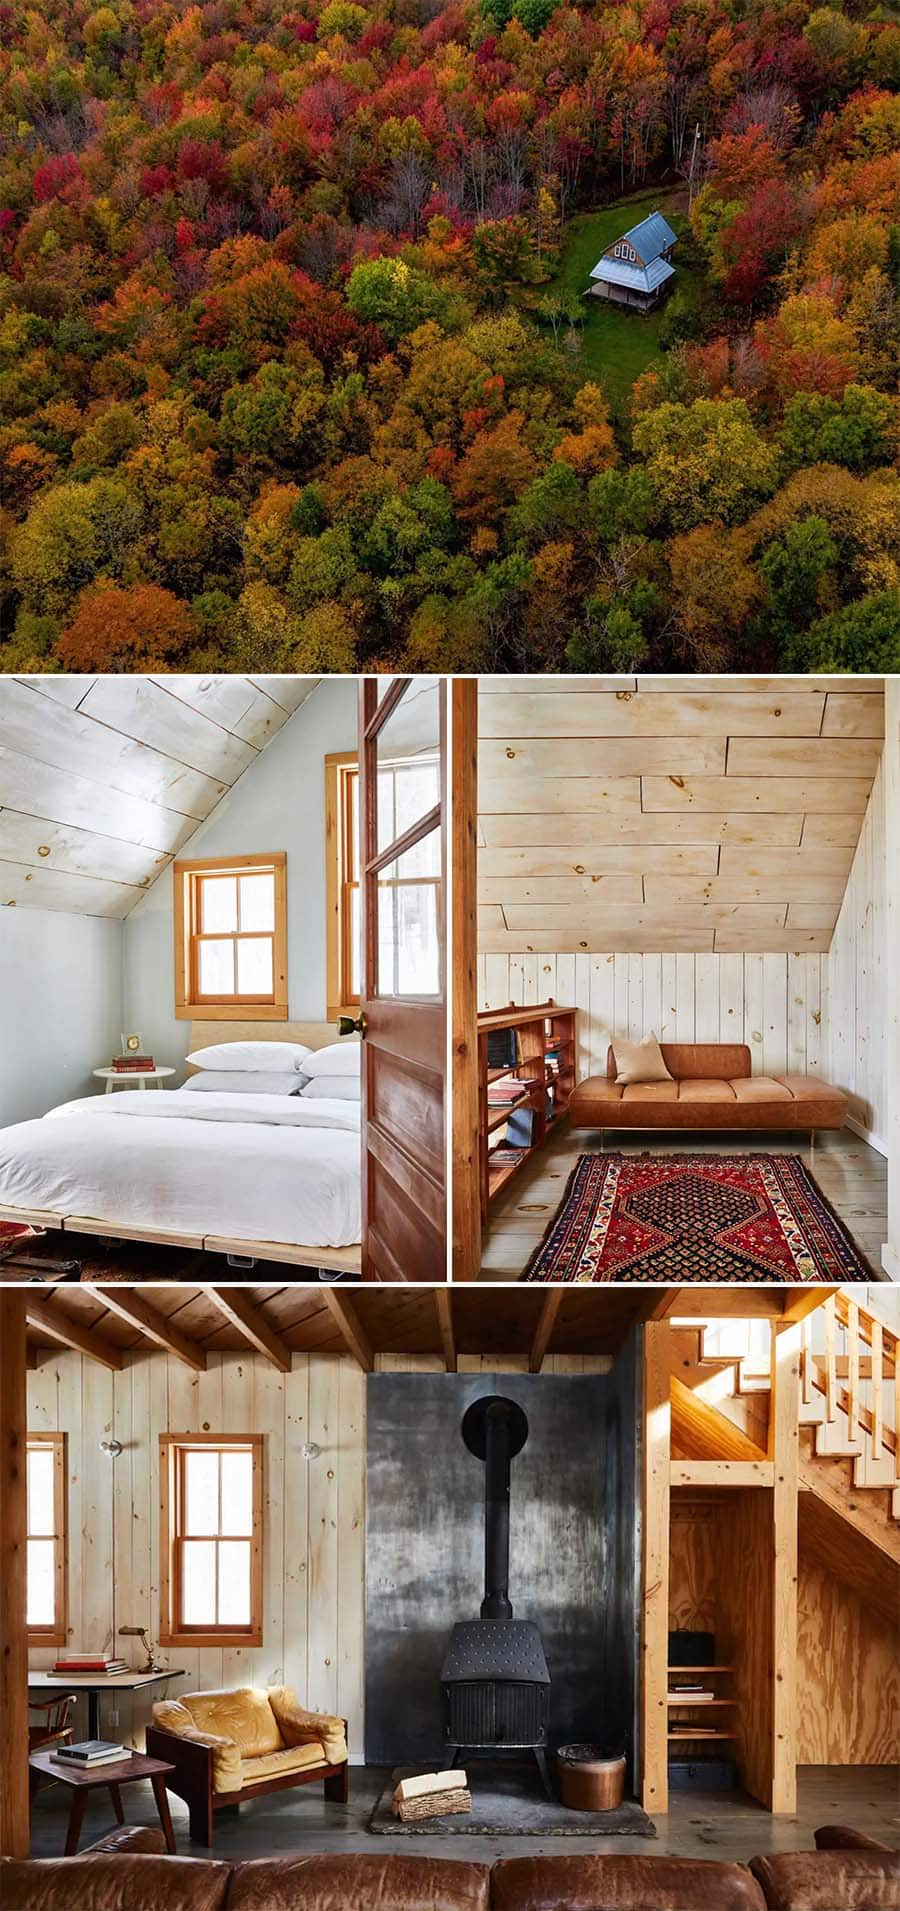 Brushland's Owls Nest cabin Airbnb in the woods in Bovina Center, New York